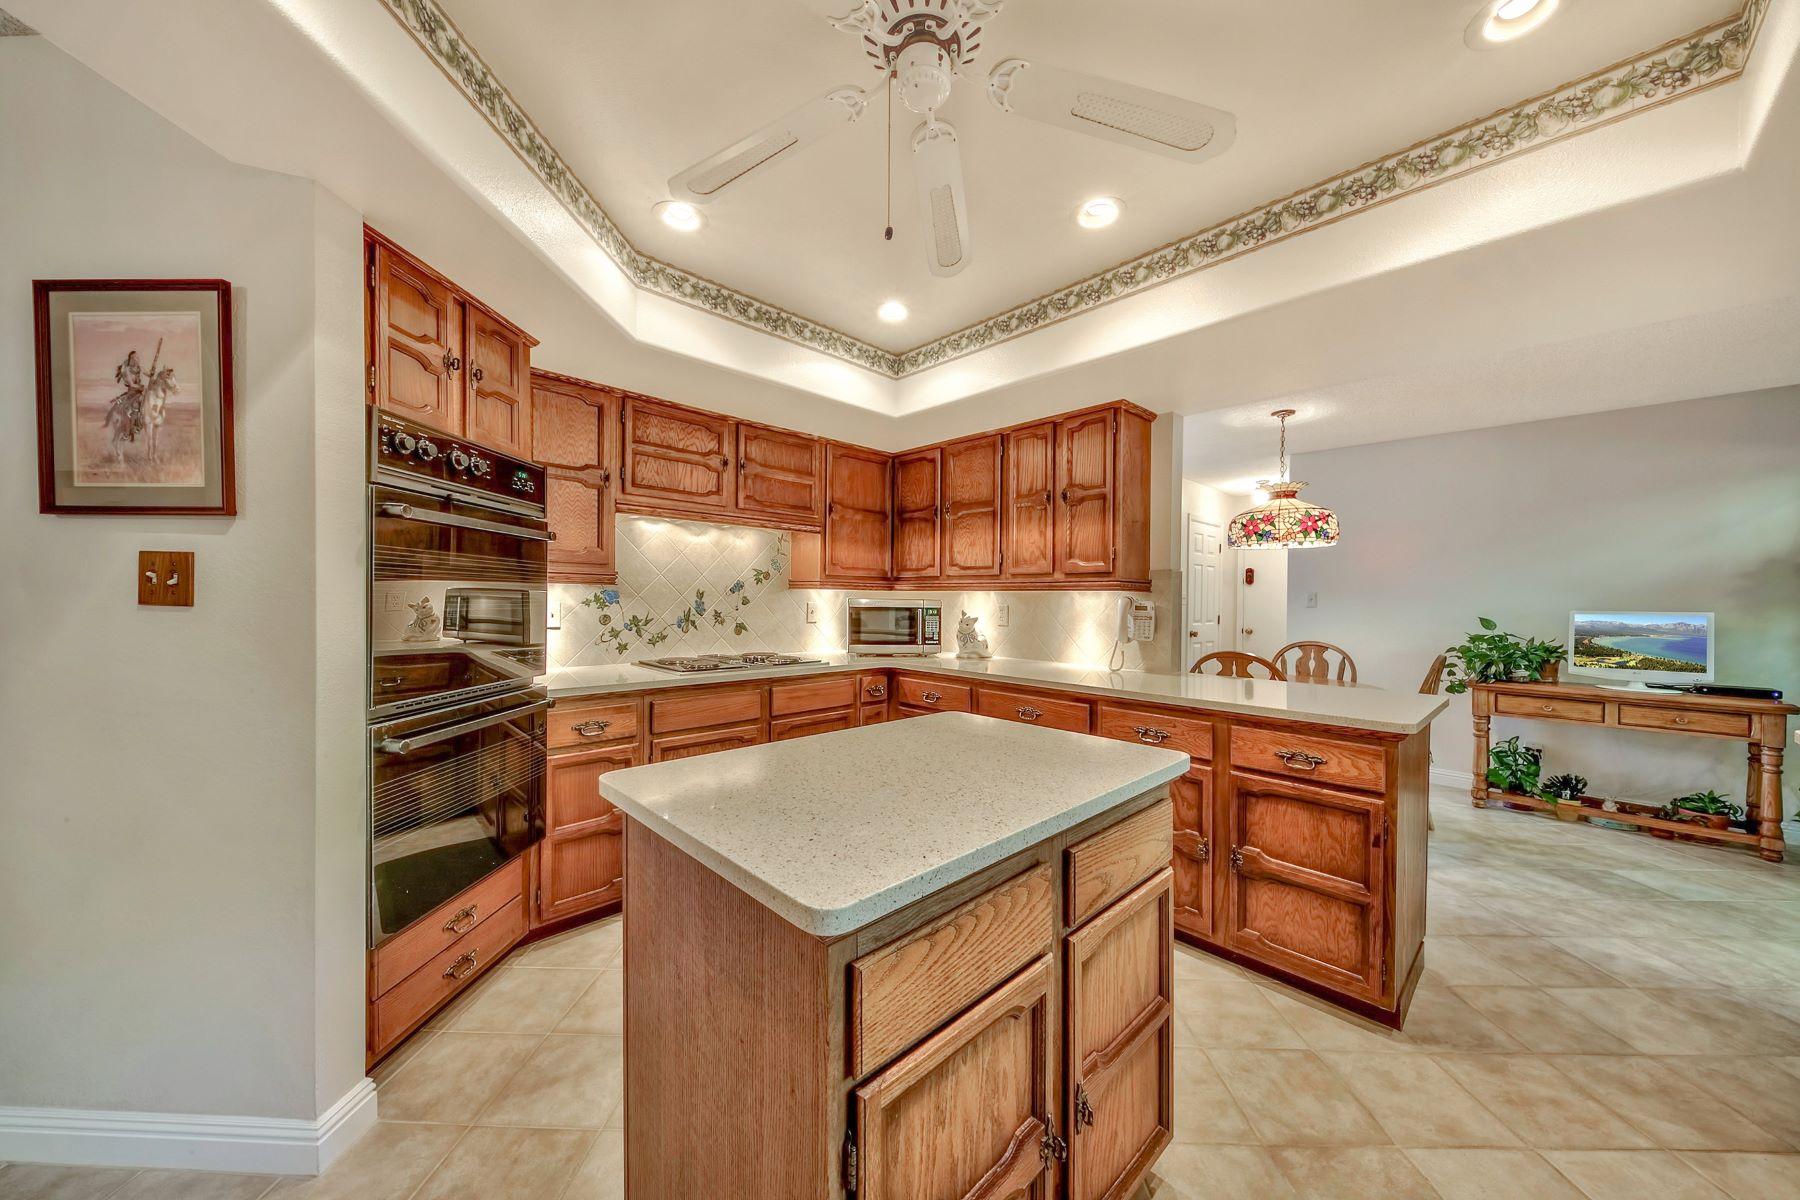 Additional photo for property listing at 415 Old Washoe Circle, Washoe Valley, Nevada 415 Old Washoe Circle 华秀谷, 内华达州 89704 美国